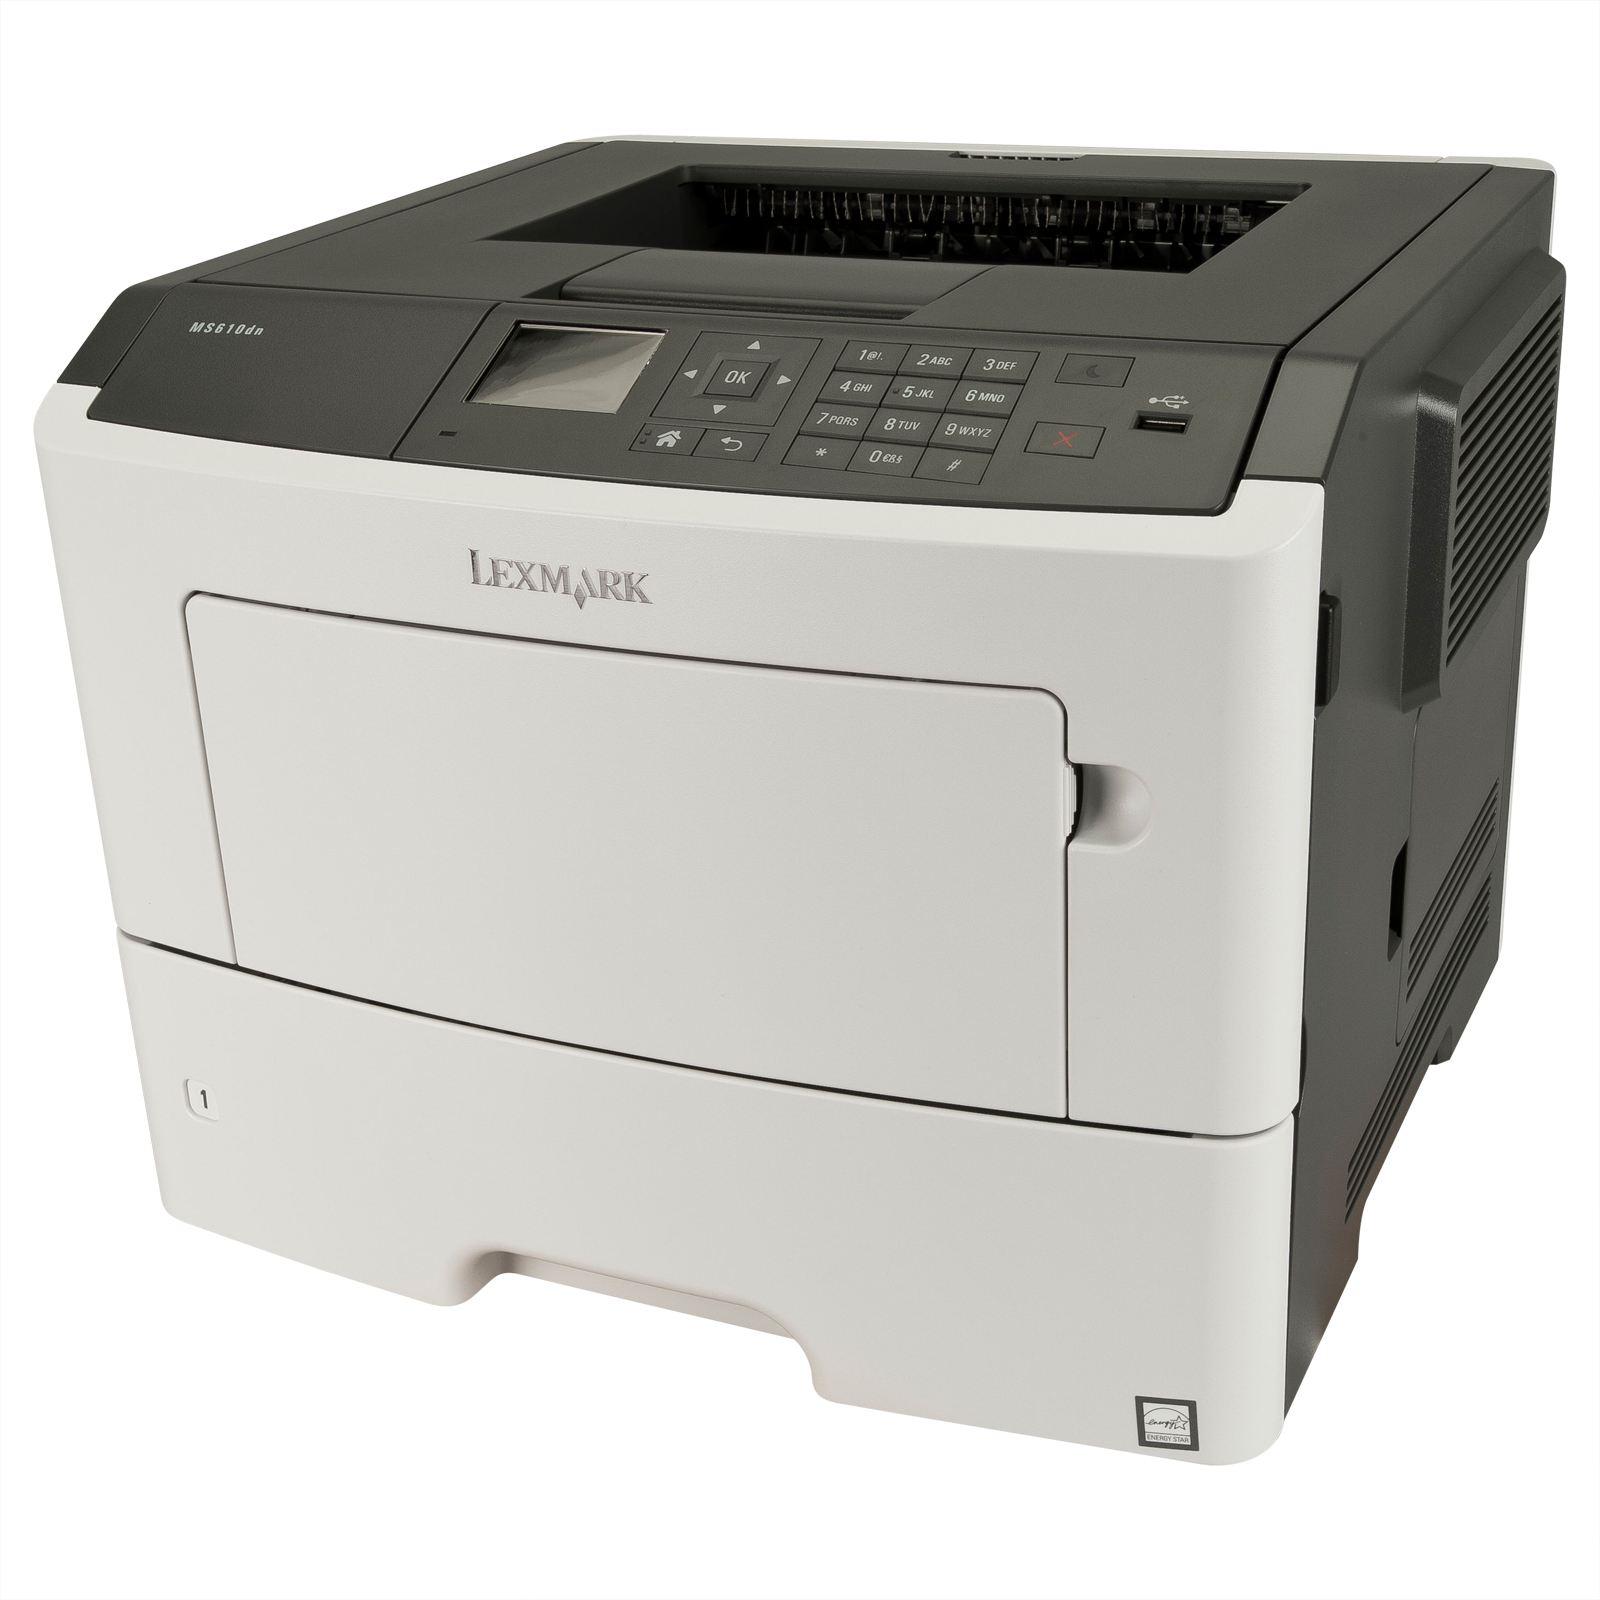 Imprimanta LaserJet Monocrom Lexmark MS610dn, A4, 16.000 pagini/luna, 1200 x 1200 DPI, Duplex, Network, USB, Pagini Printate 50k-100k, 2 Ani Garantie, Refurbished - imaginea 1